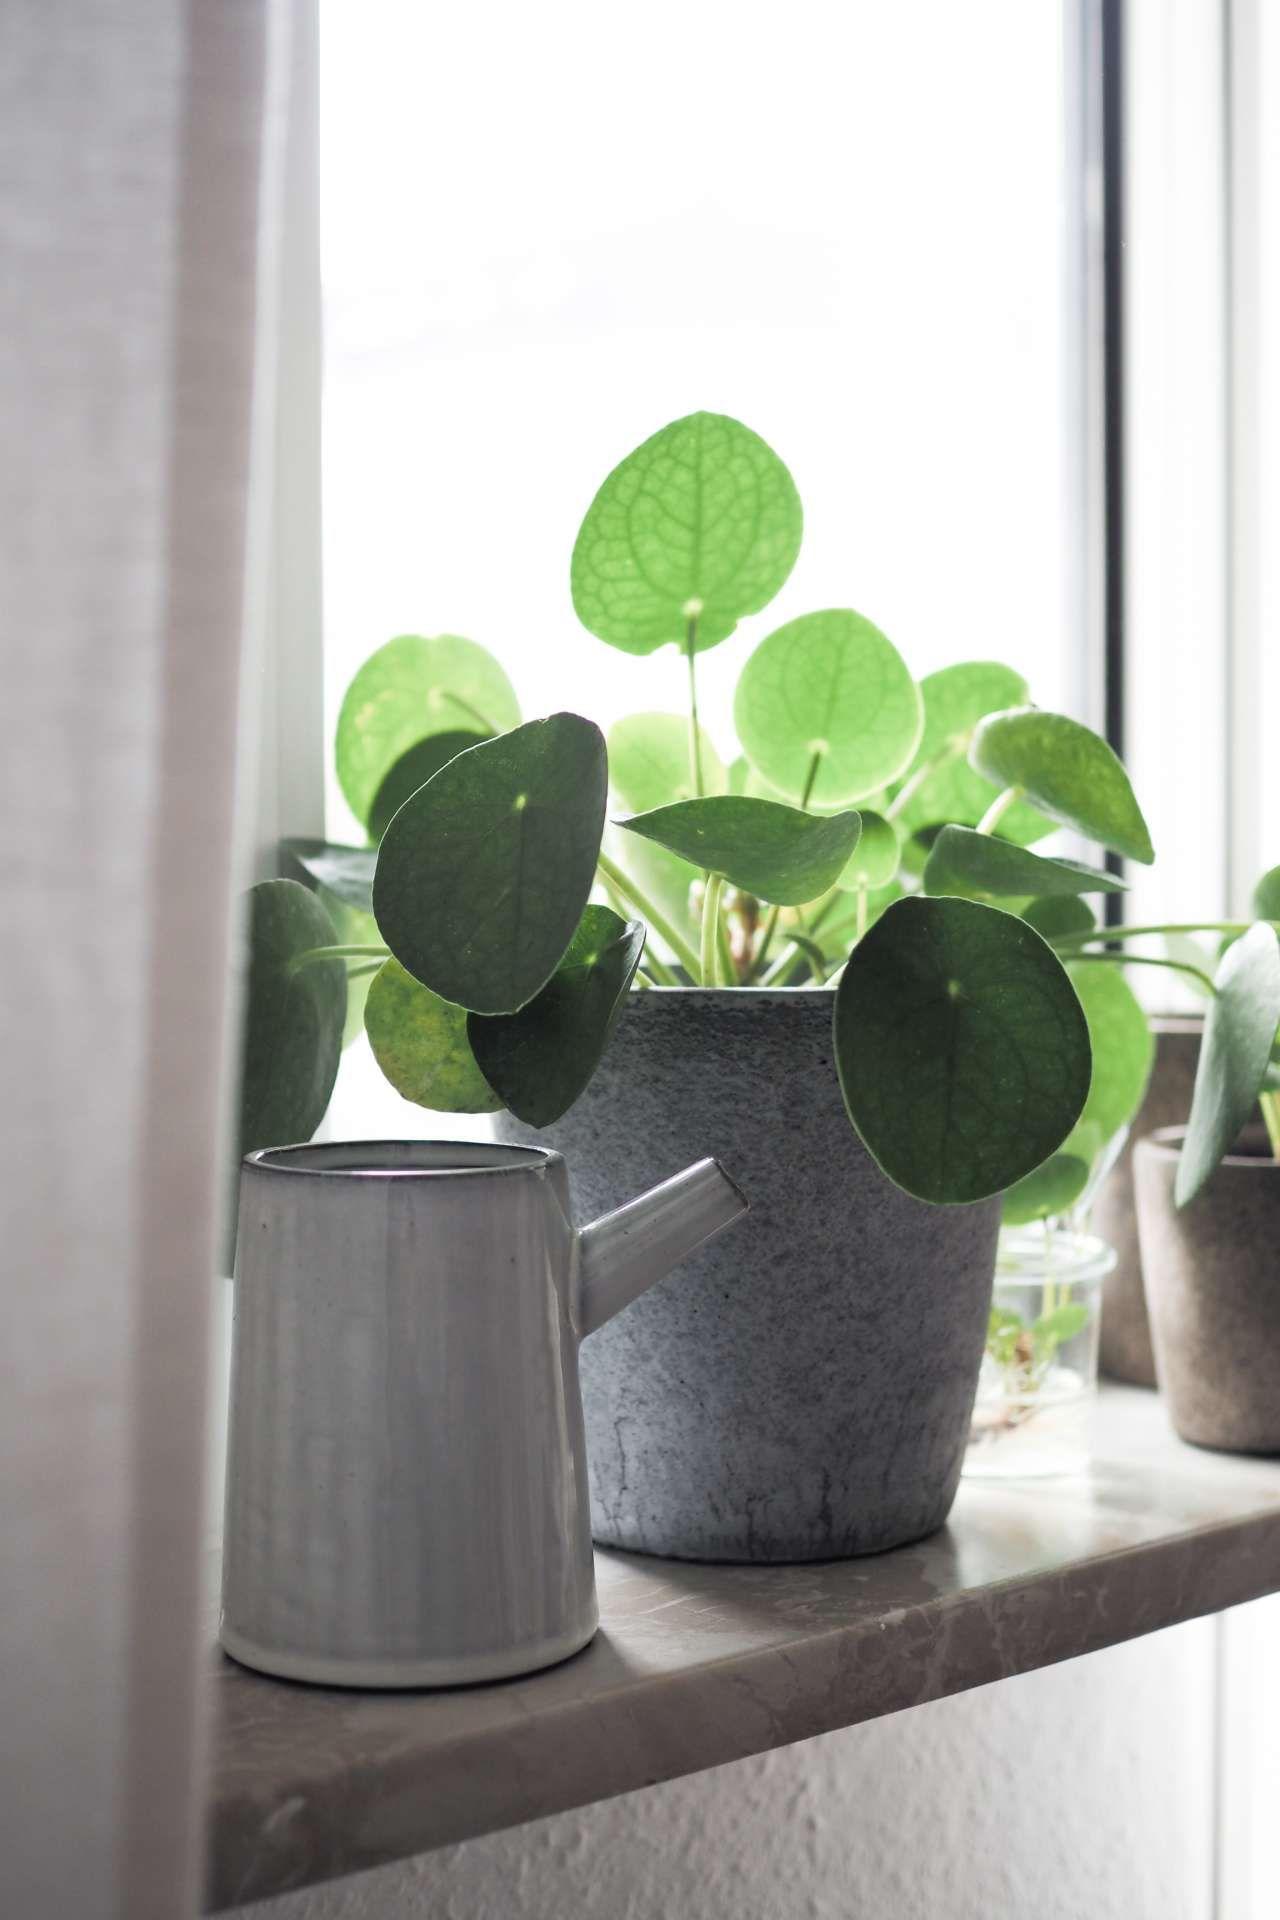 Urban jungle bloggers new beginnings succulents plants for Zimmerpflanzen wohnzimmer